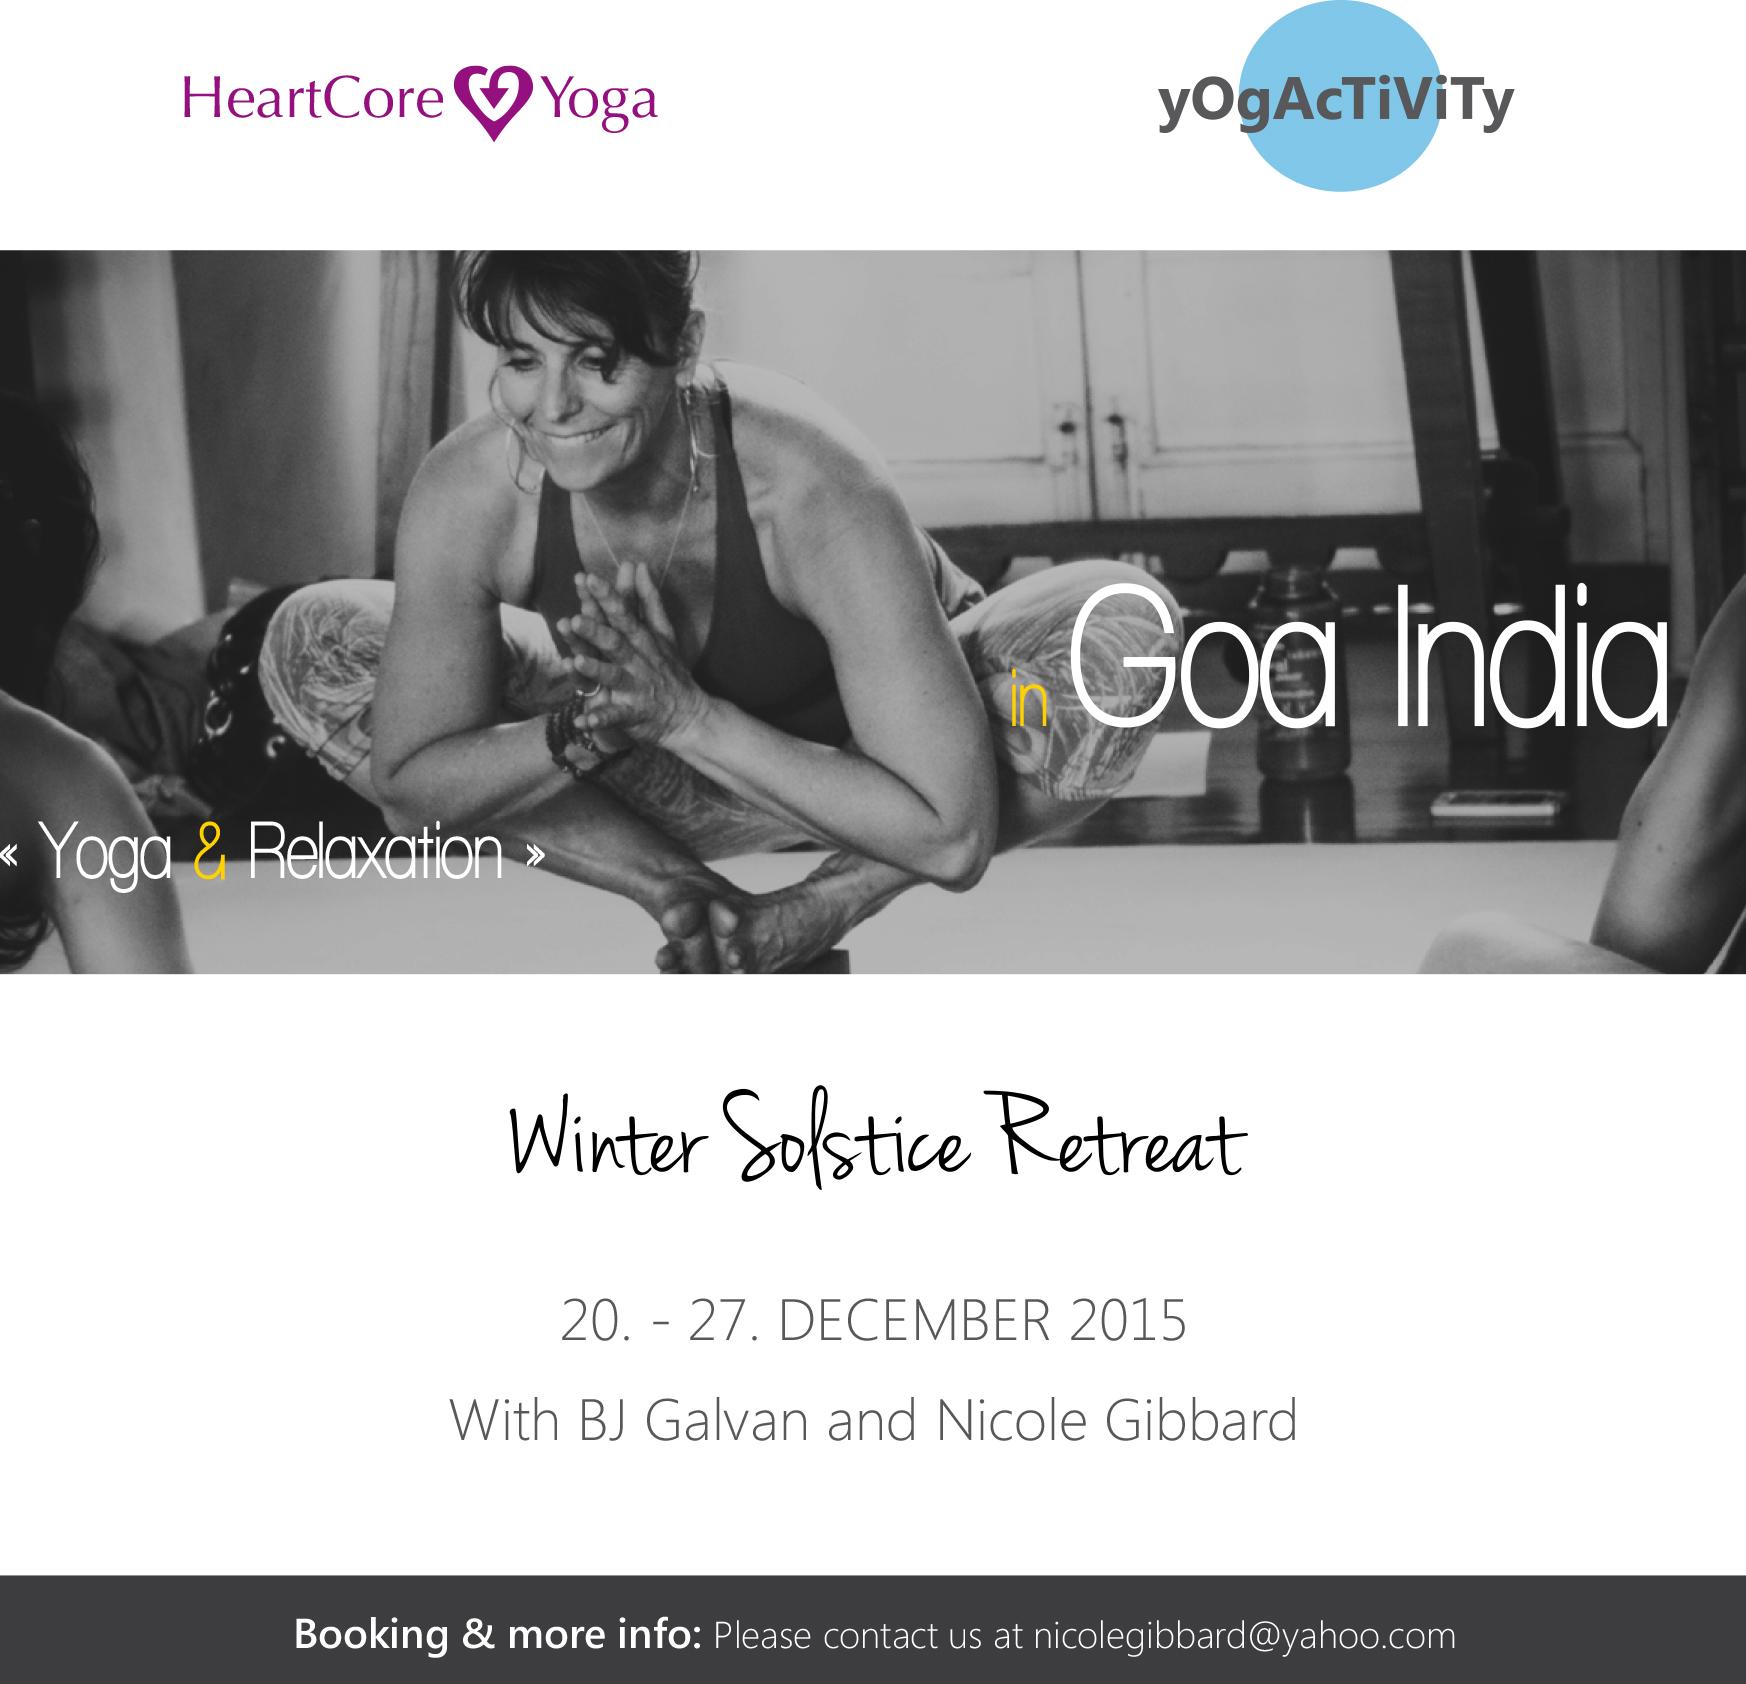 20 DEC TO 27 DEC| 7 DAYS | yOgAcTiViTy & HeartCore Yoga Winter Solstice Retreat by Nicole Gibbard and Benita J Galvan